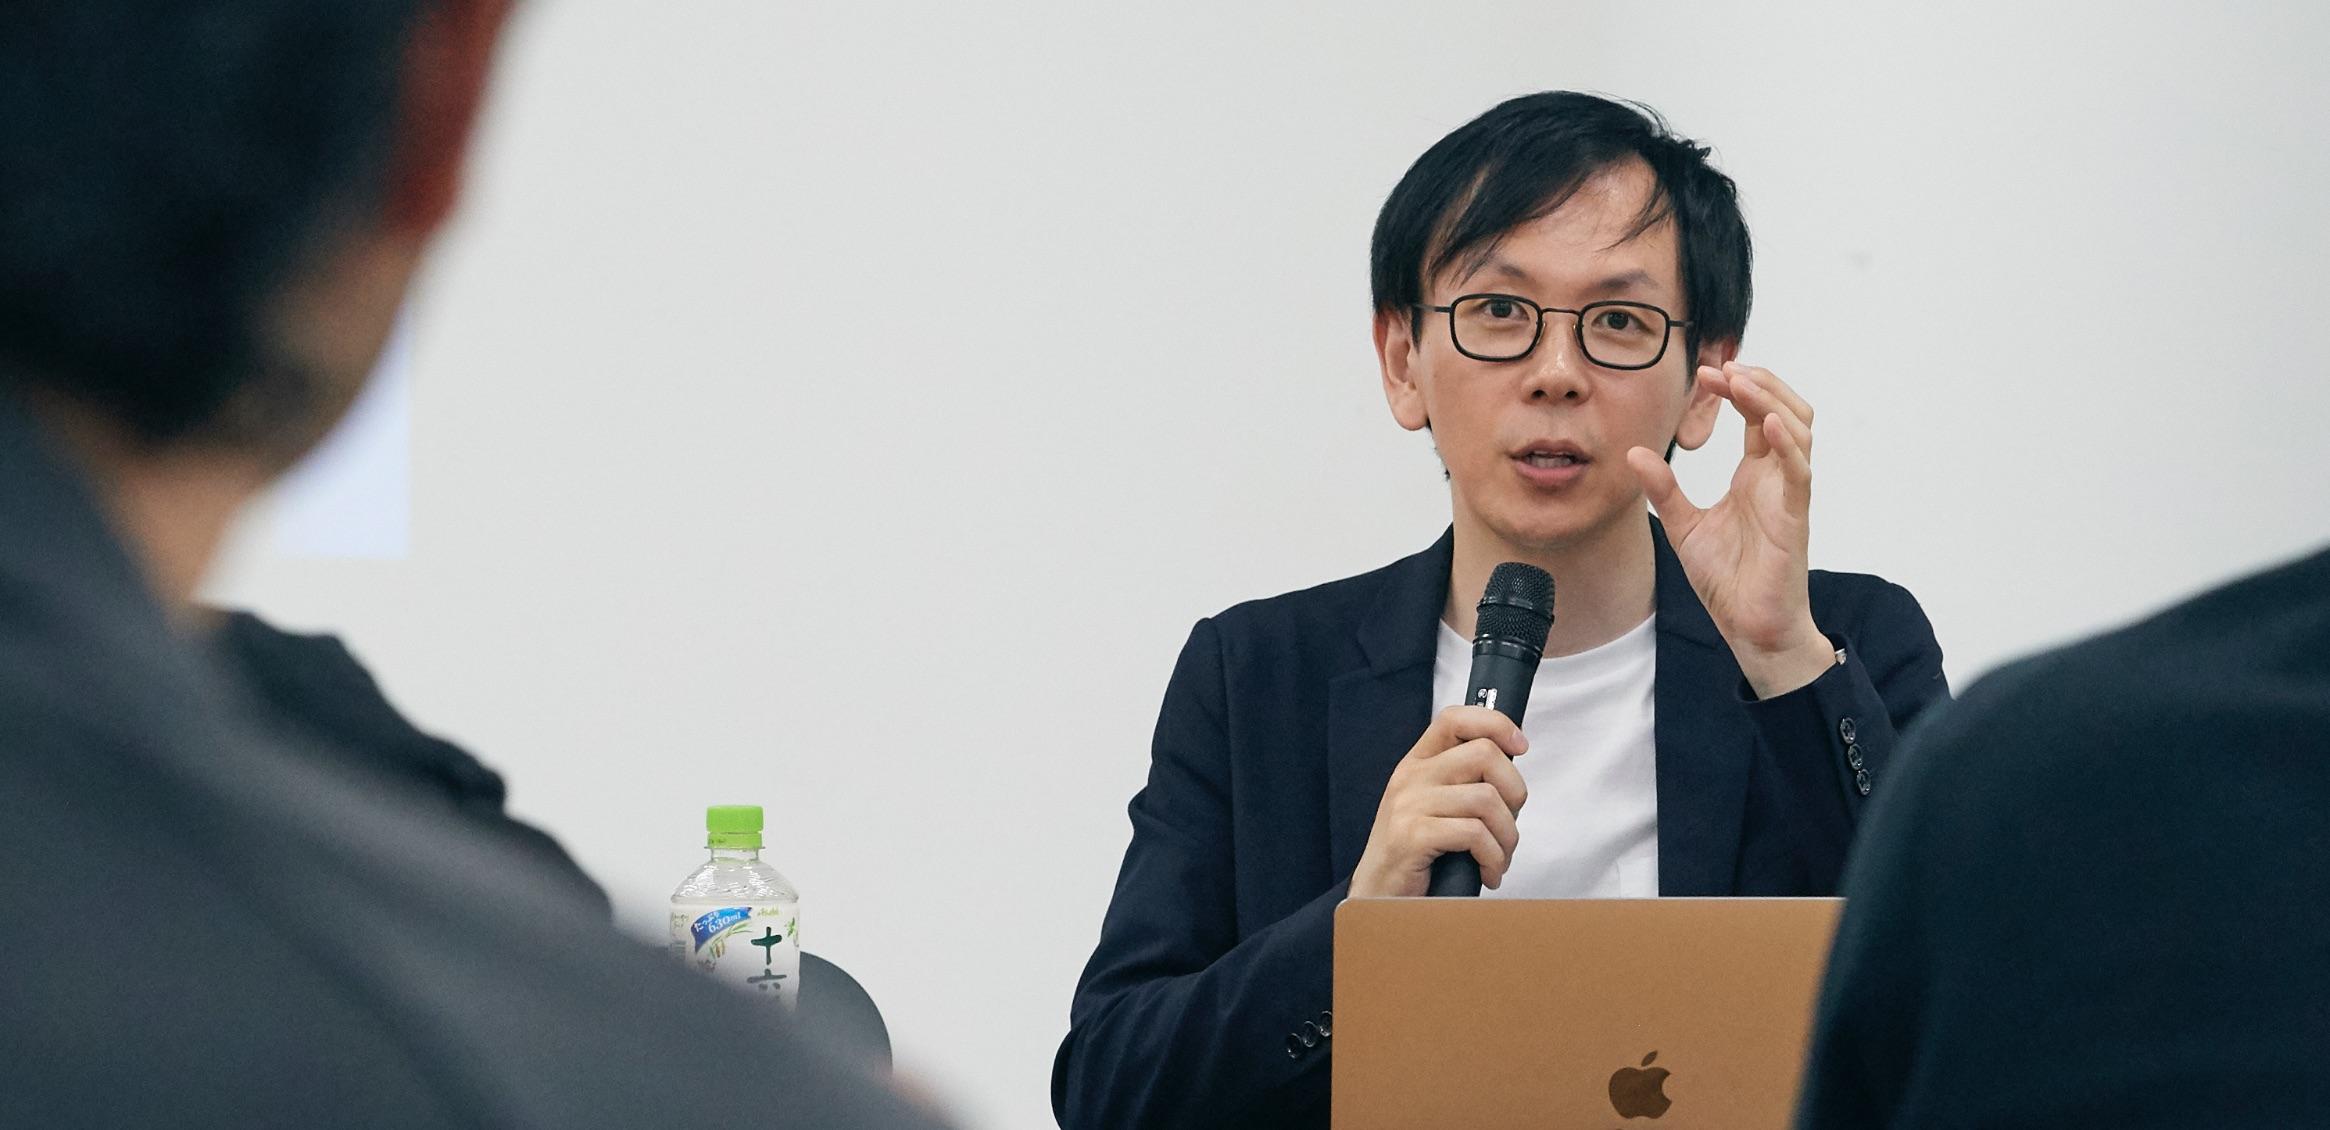 渡邊恵太 明治大学 総合数理学部 先端メディアサイエンス学科 准教授